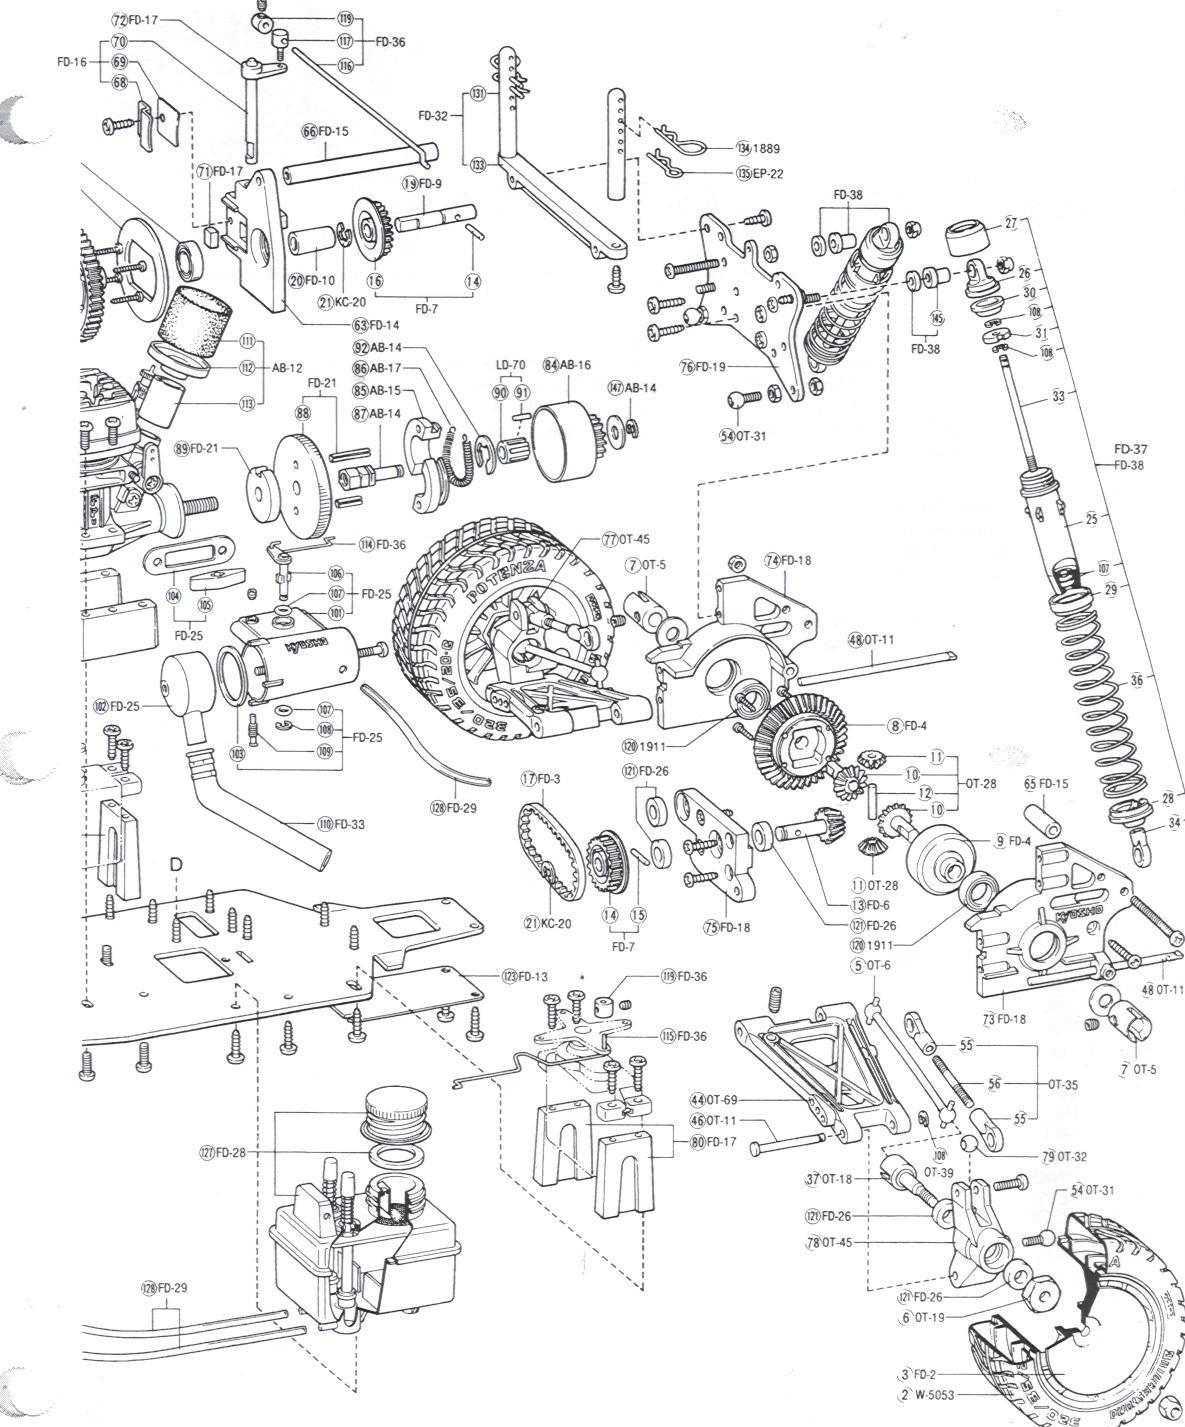 KYOSHO RS200 MANUAL PDF